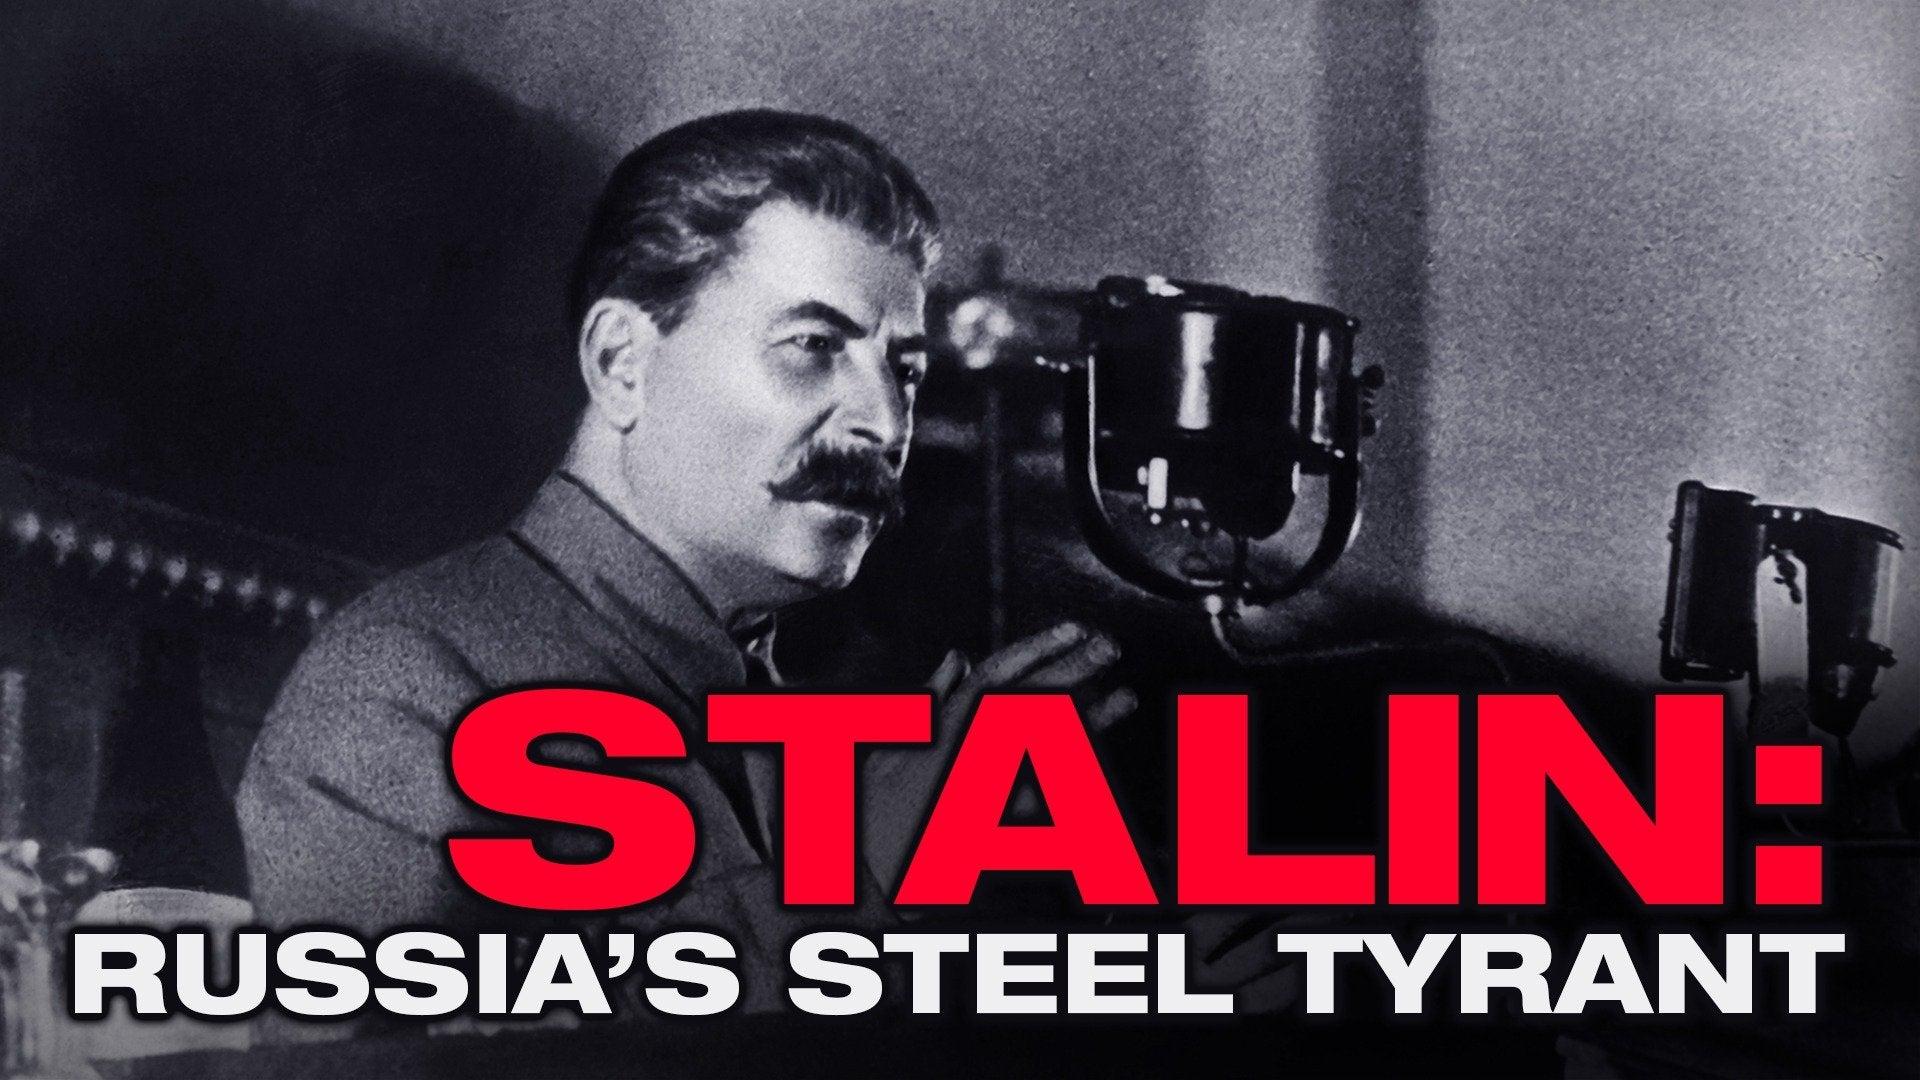 Stalin: Russia's Steel Tyrant